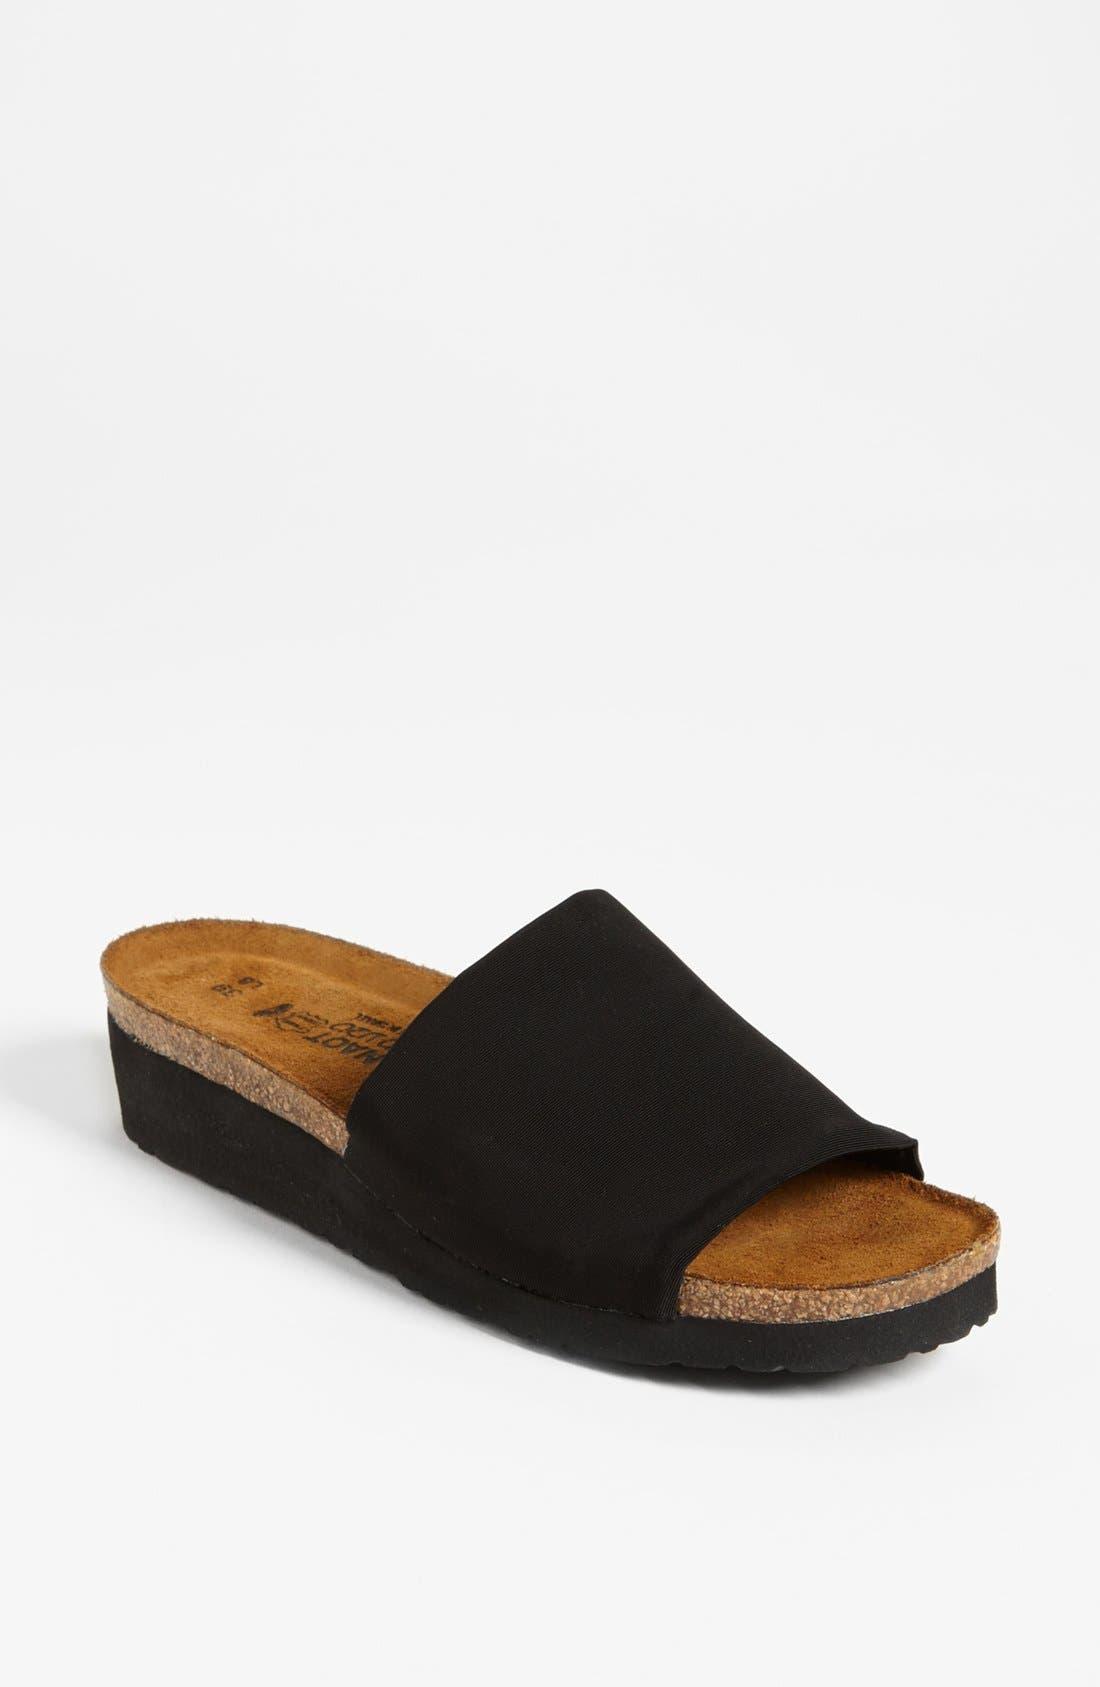 Alternate Image 1 Selected - Naot 'Alana' Sandal